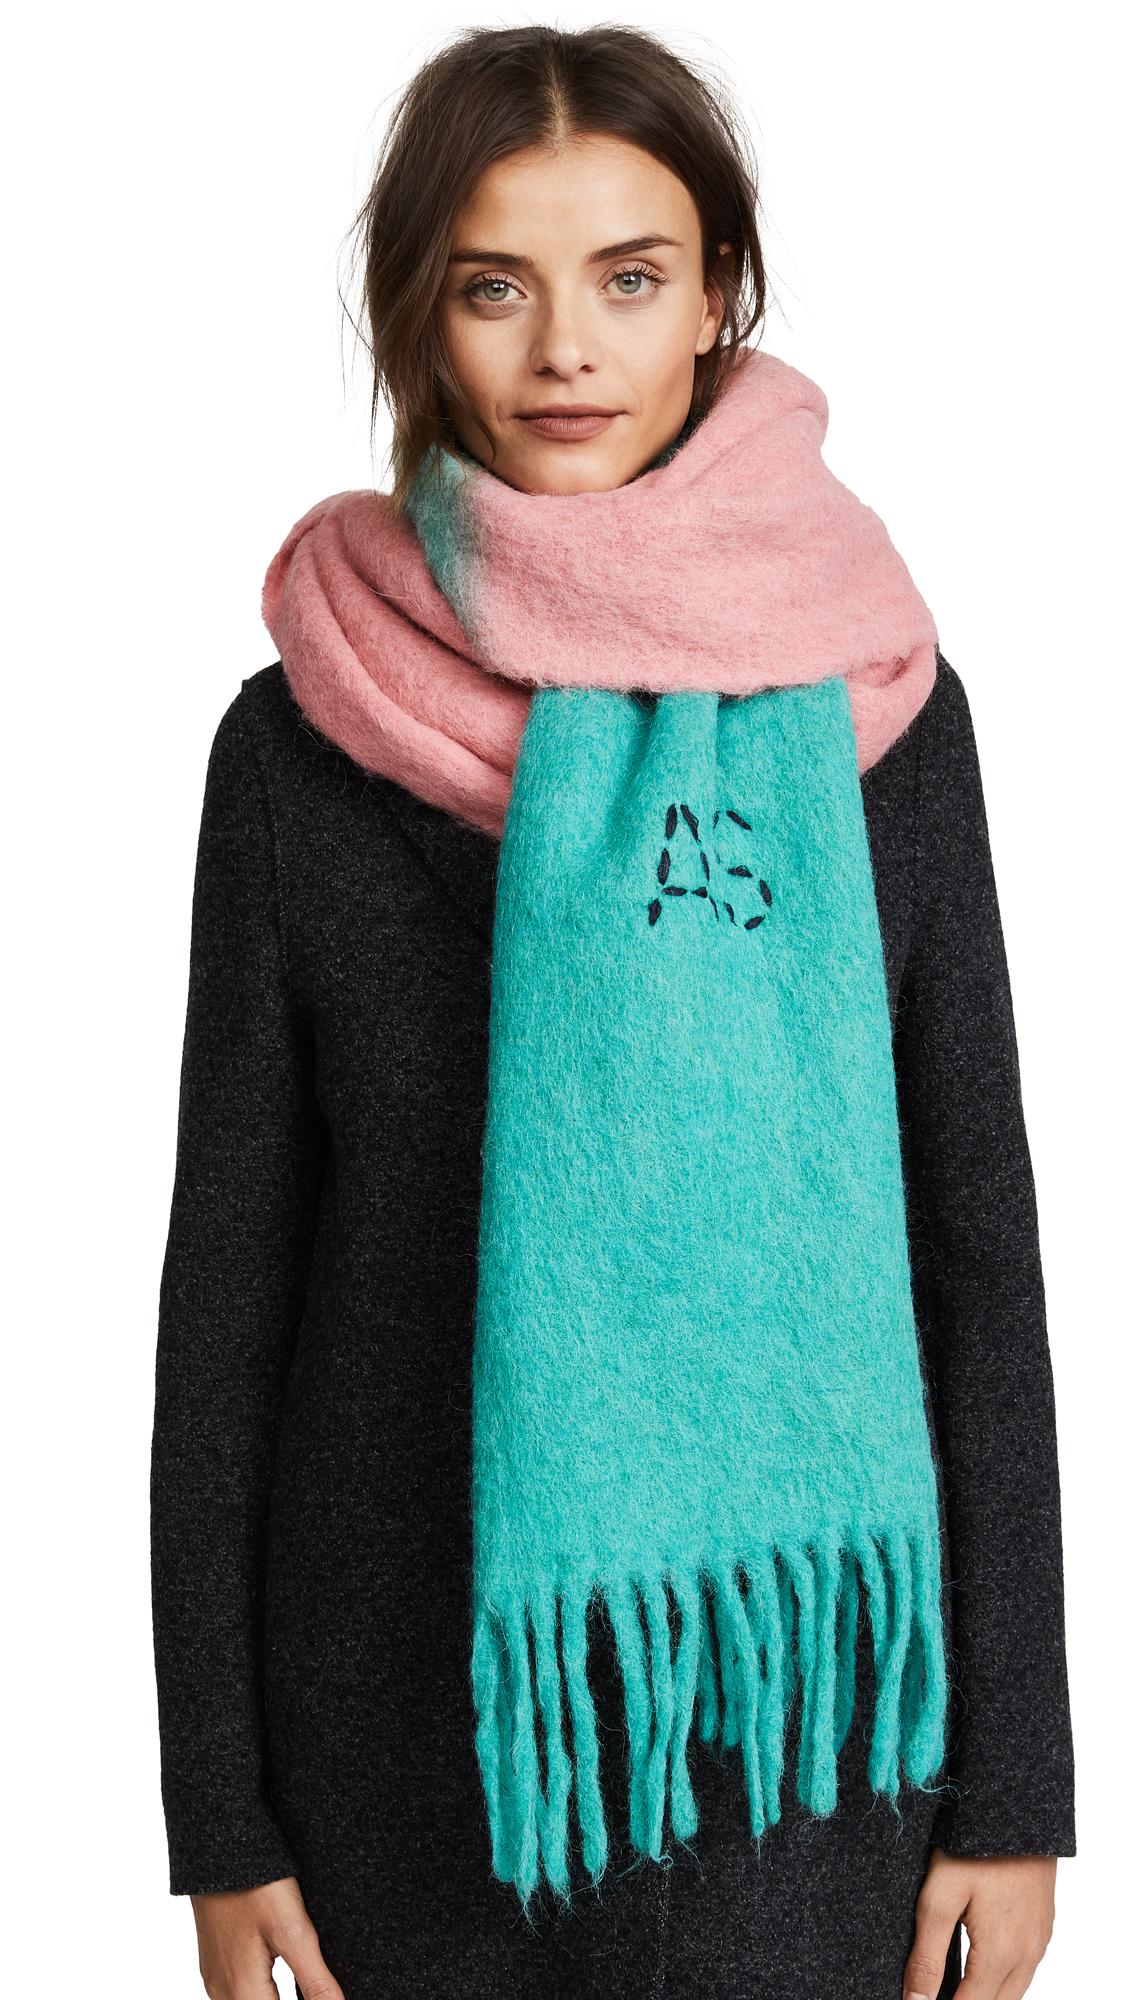 Acne Studios Kelowna Dye Scarf - Pink/Mint